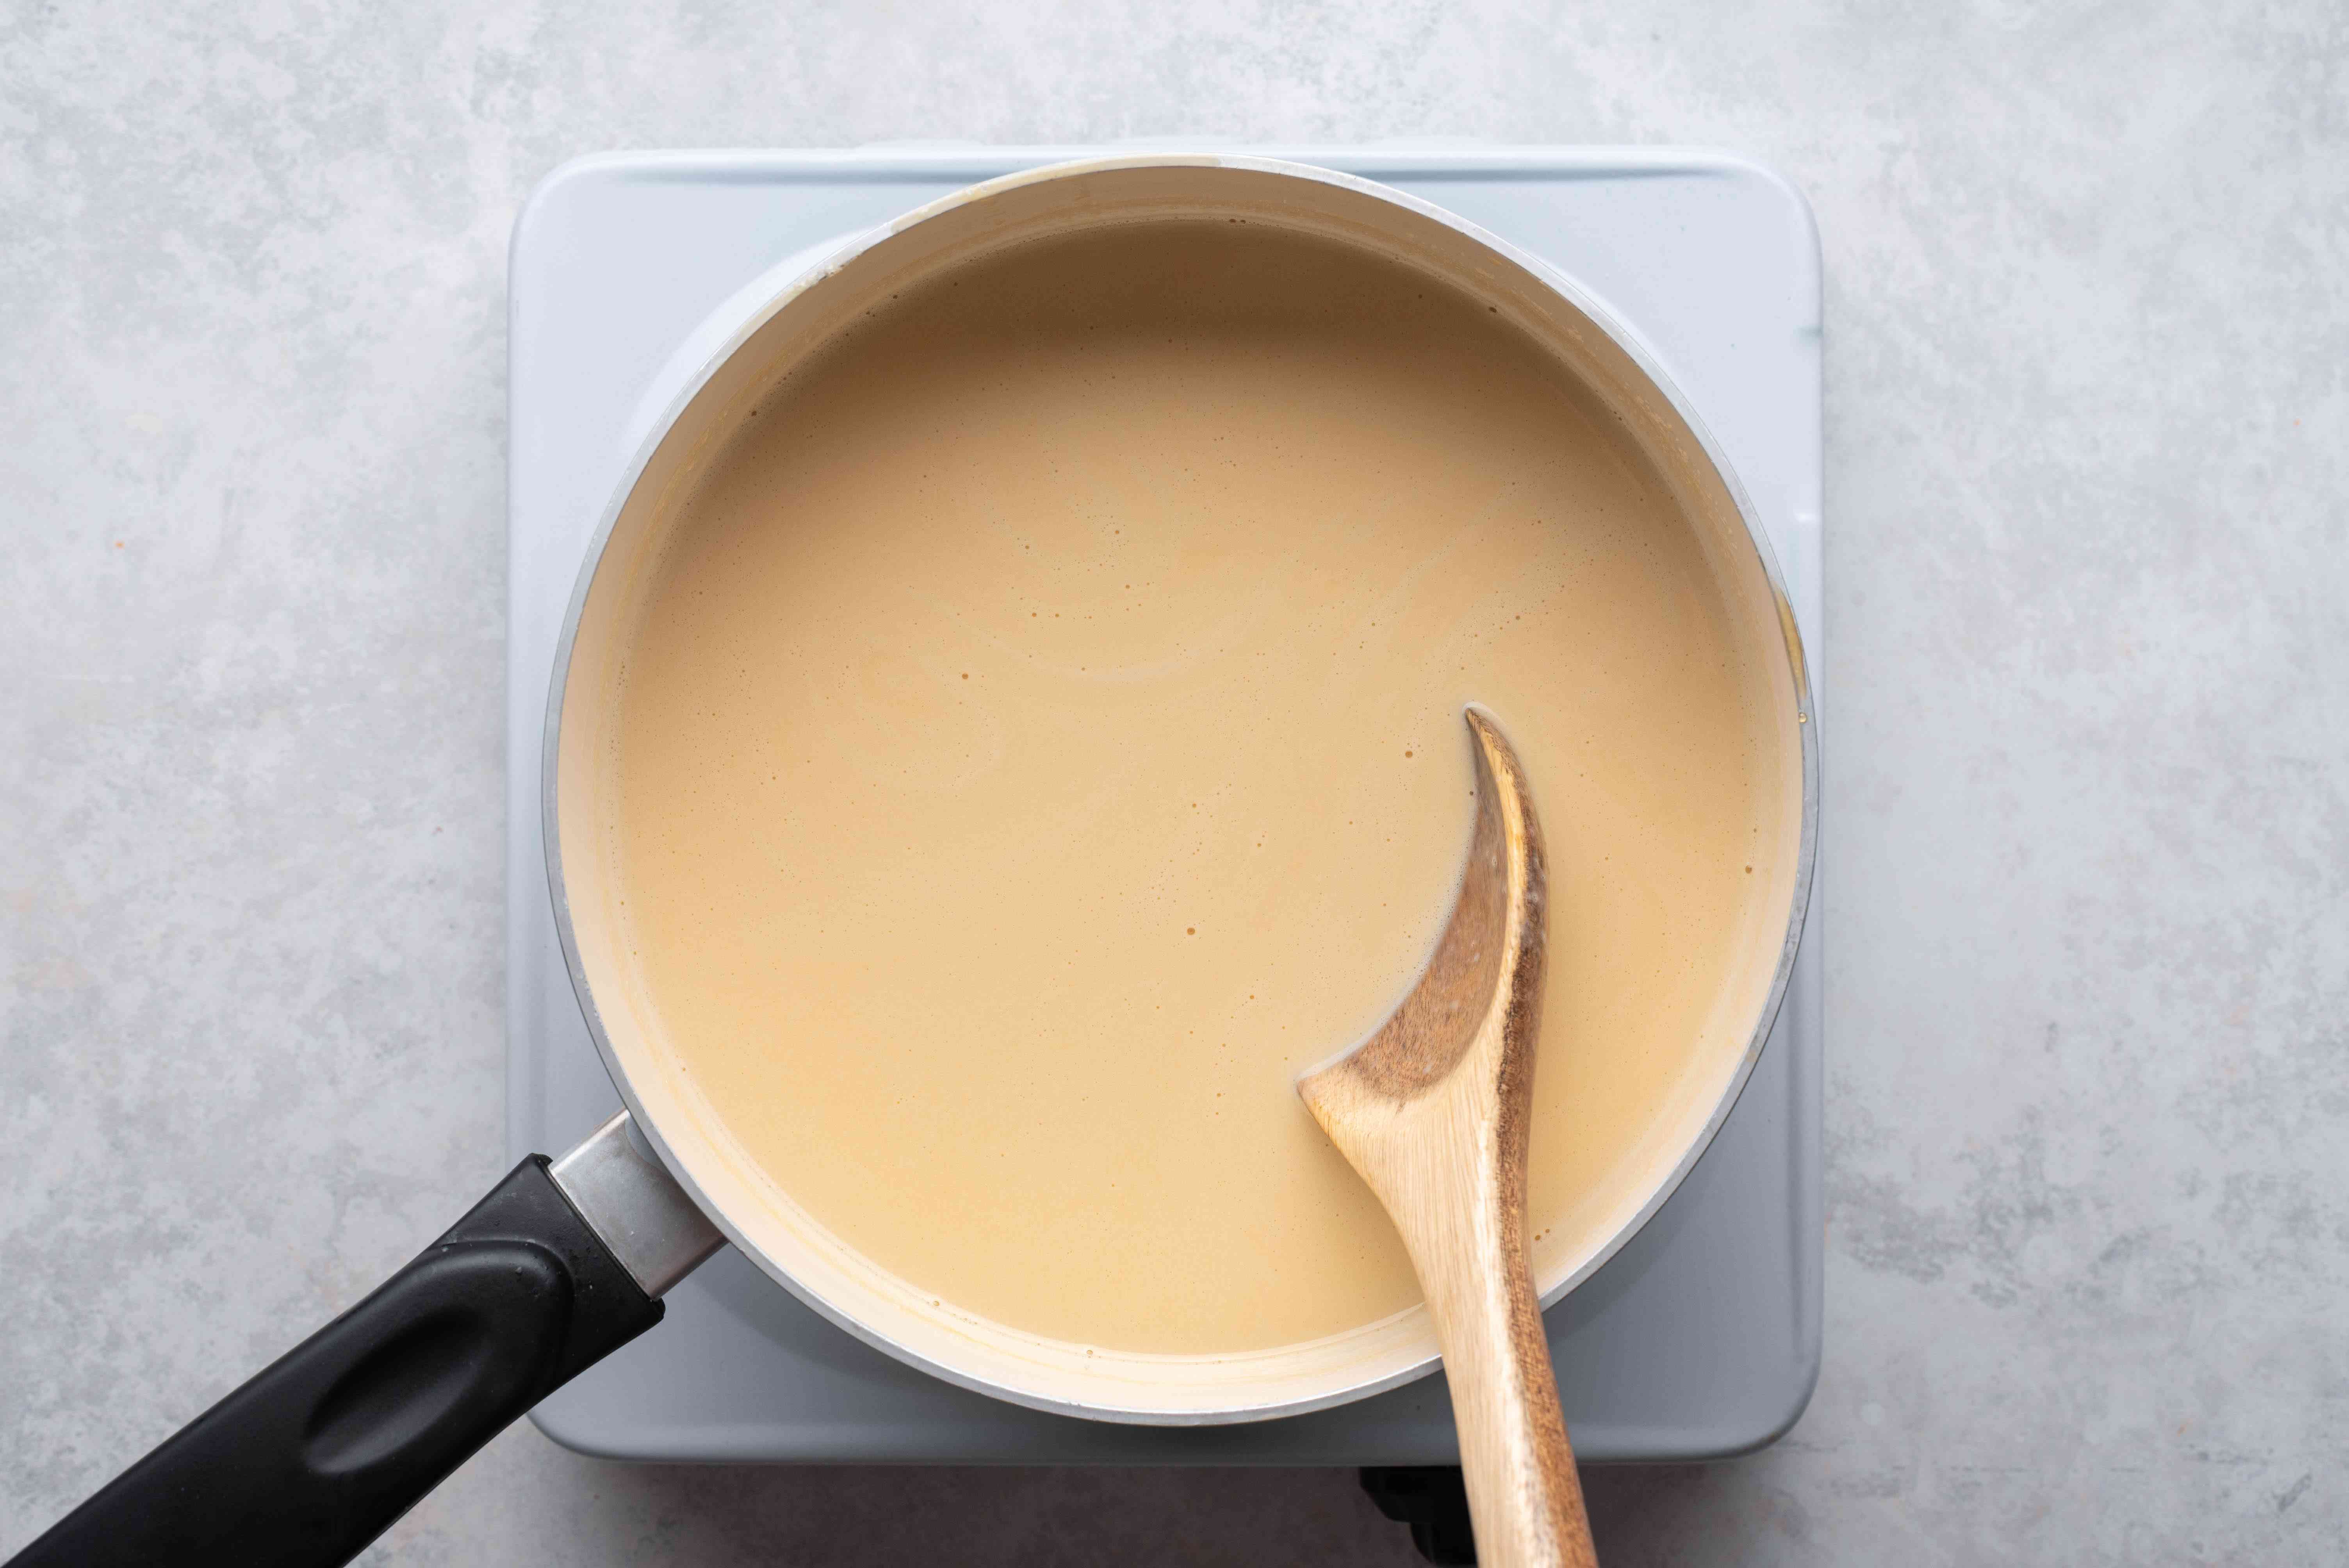 custard mixture in a saucepan